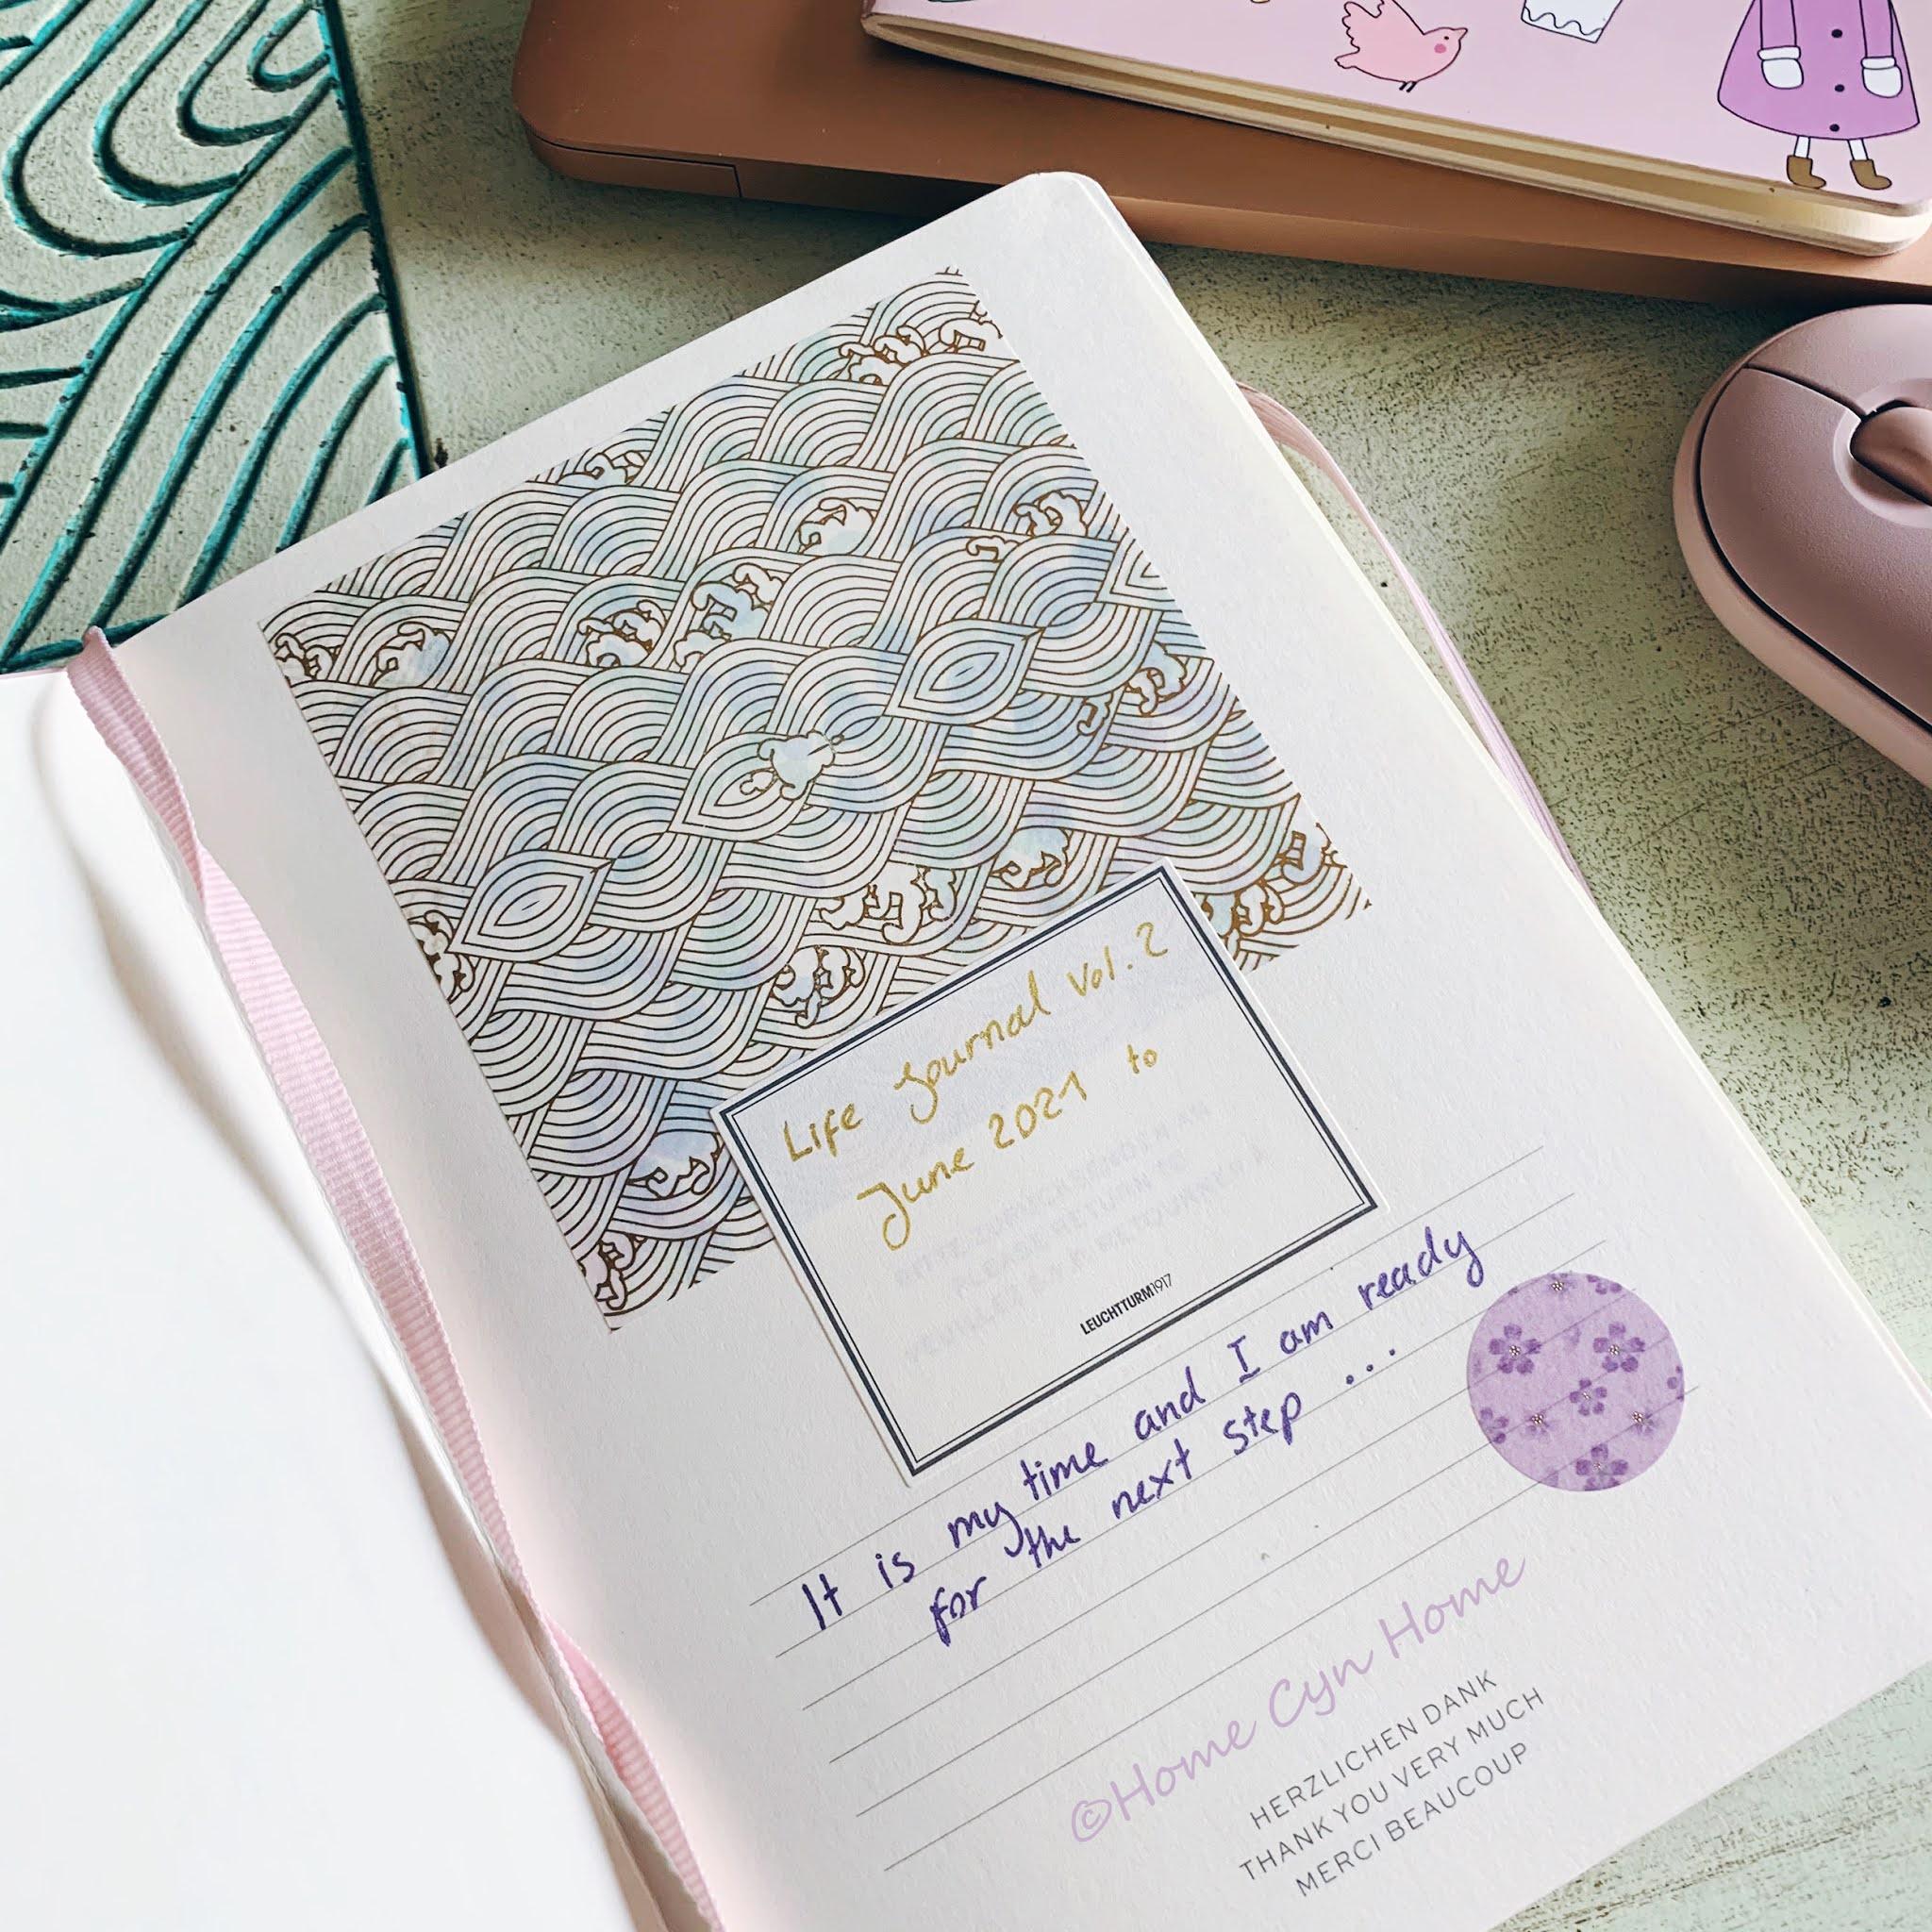 a peak inside my life journal